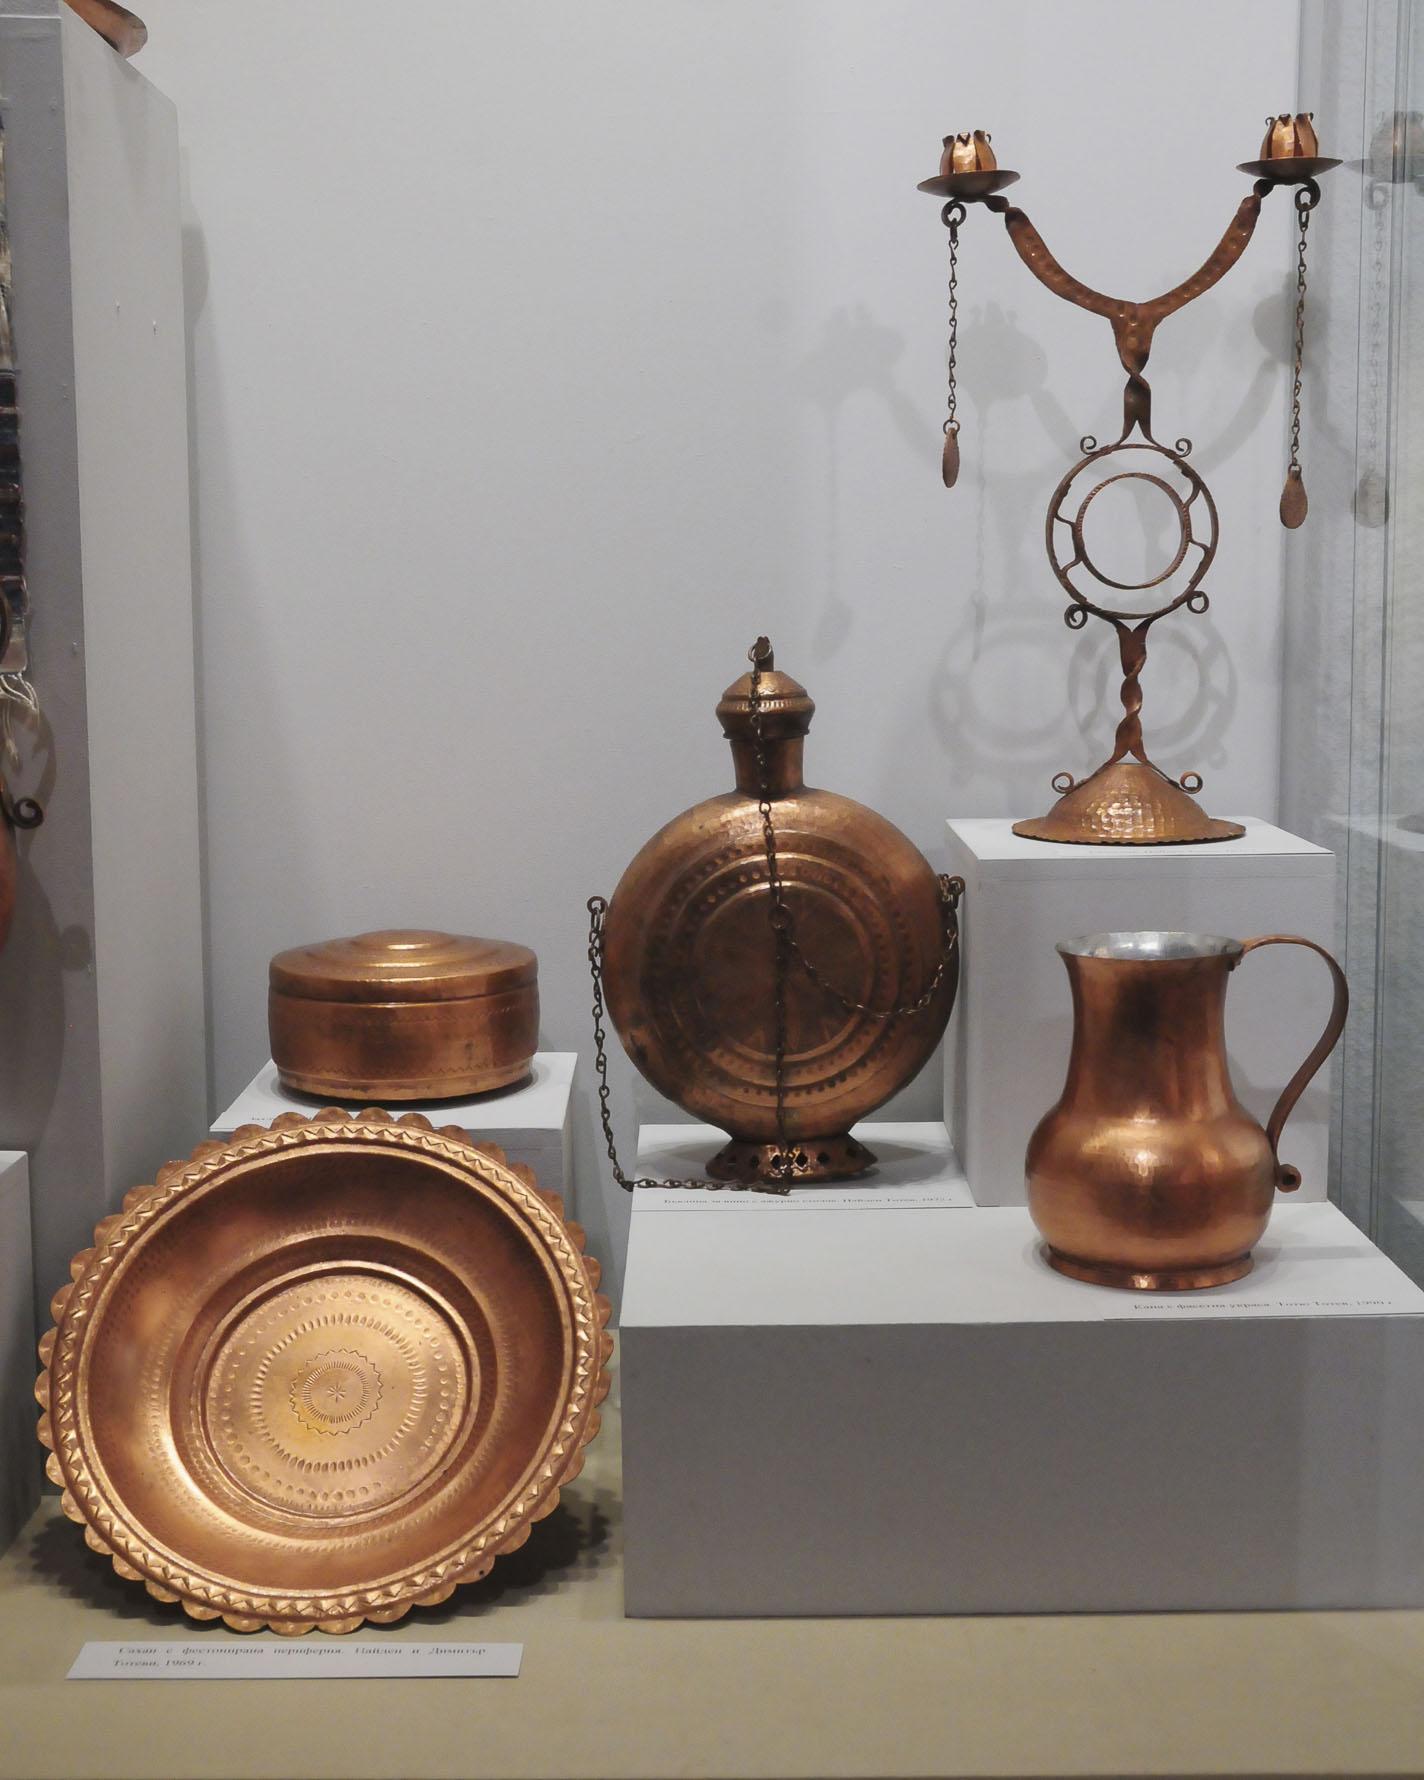 troyan-museum-mednikarstvo-ot-troyanskiq-krai-8